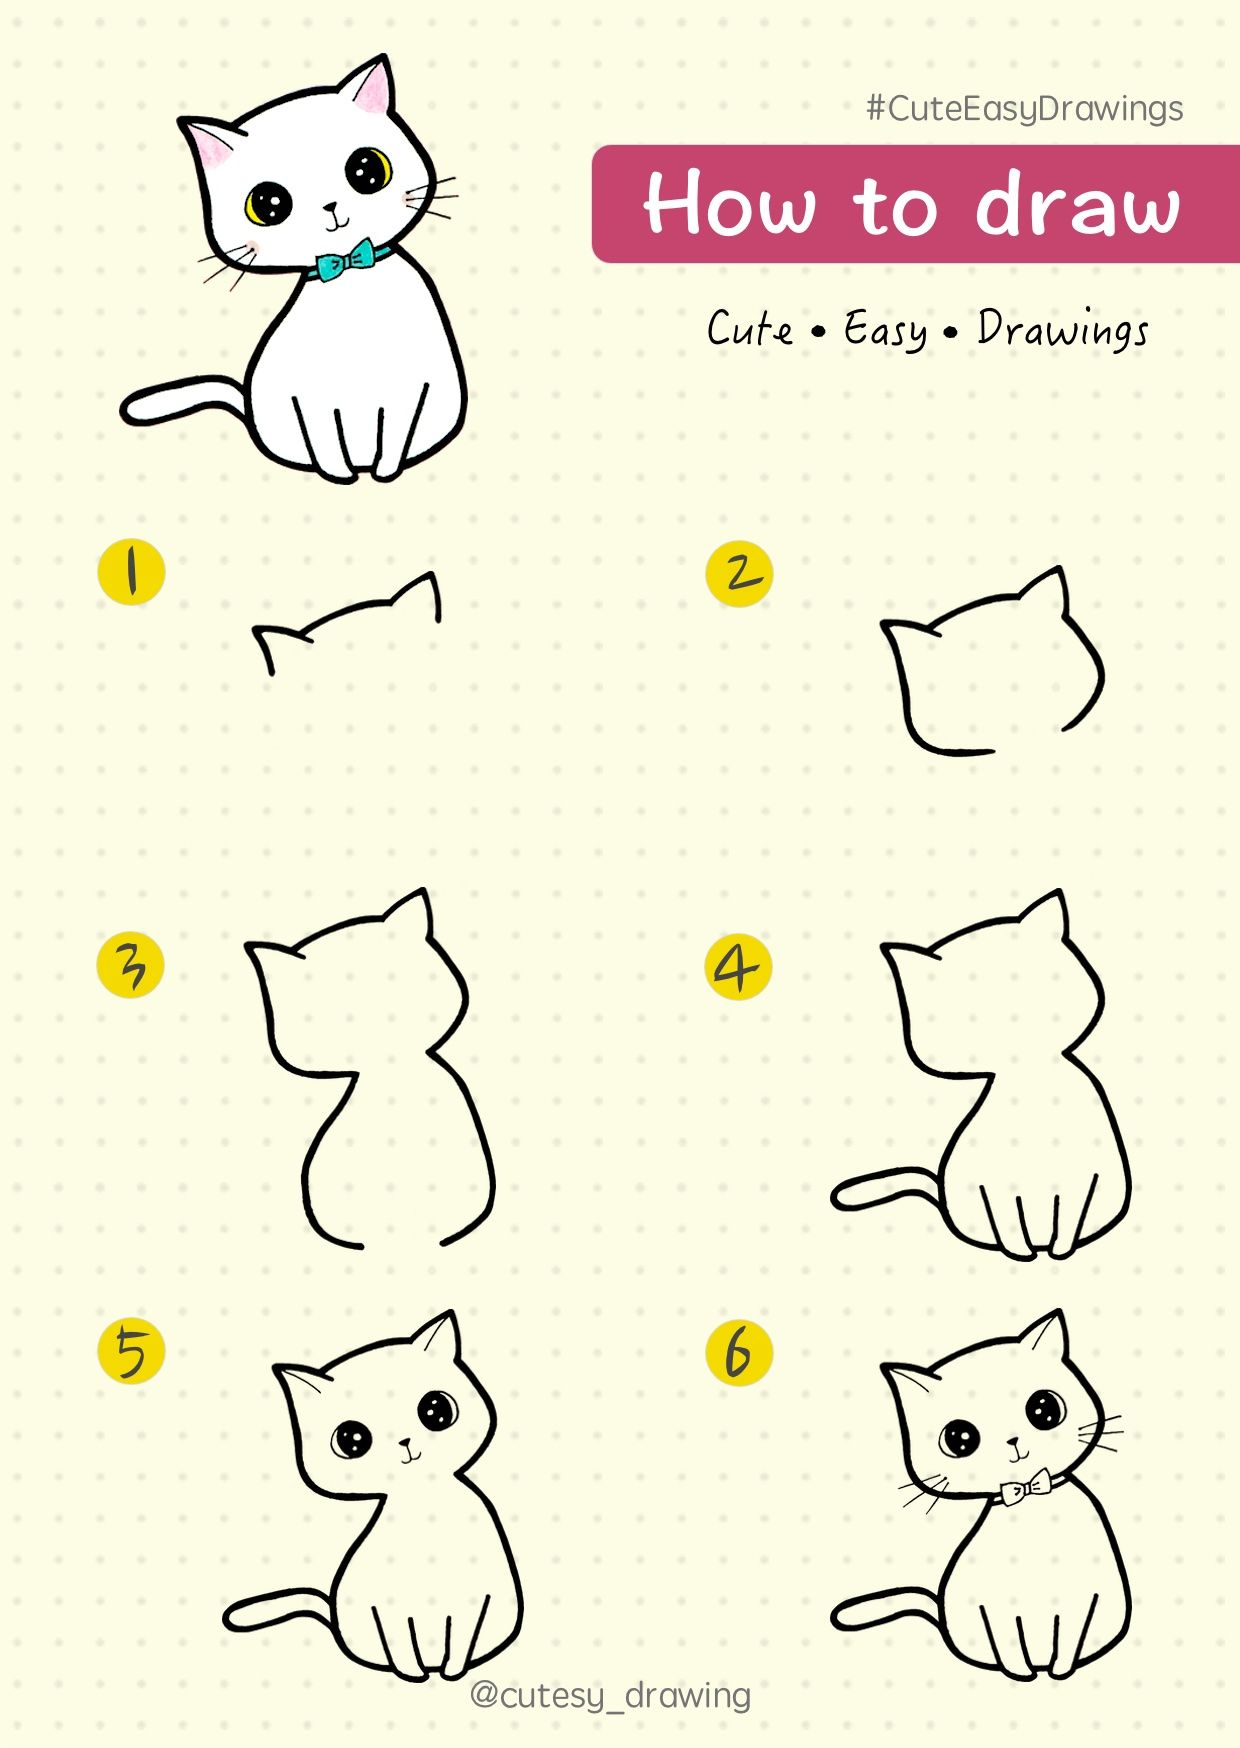 How To Draw Cute Kitten Cat Step By Step Tutorial Cat Kitten